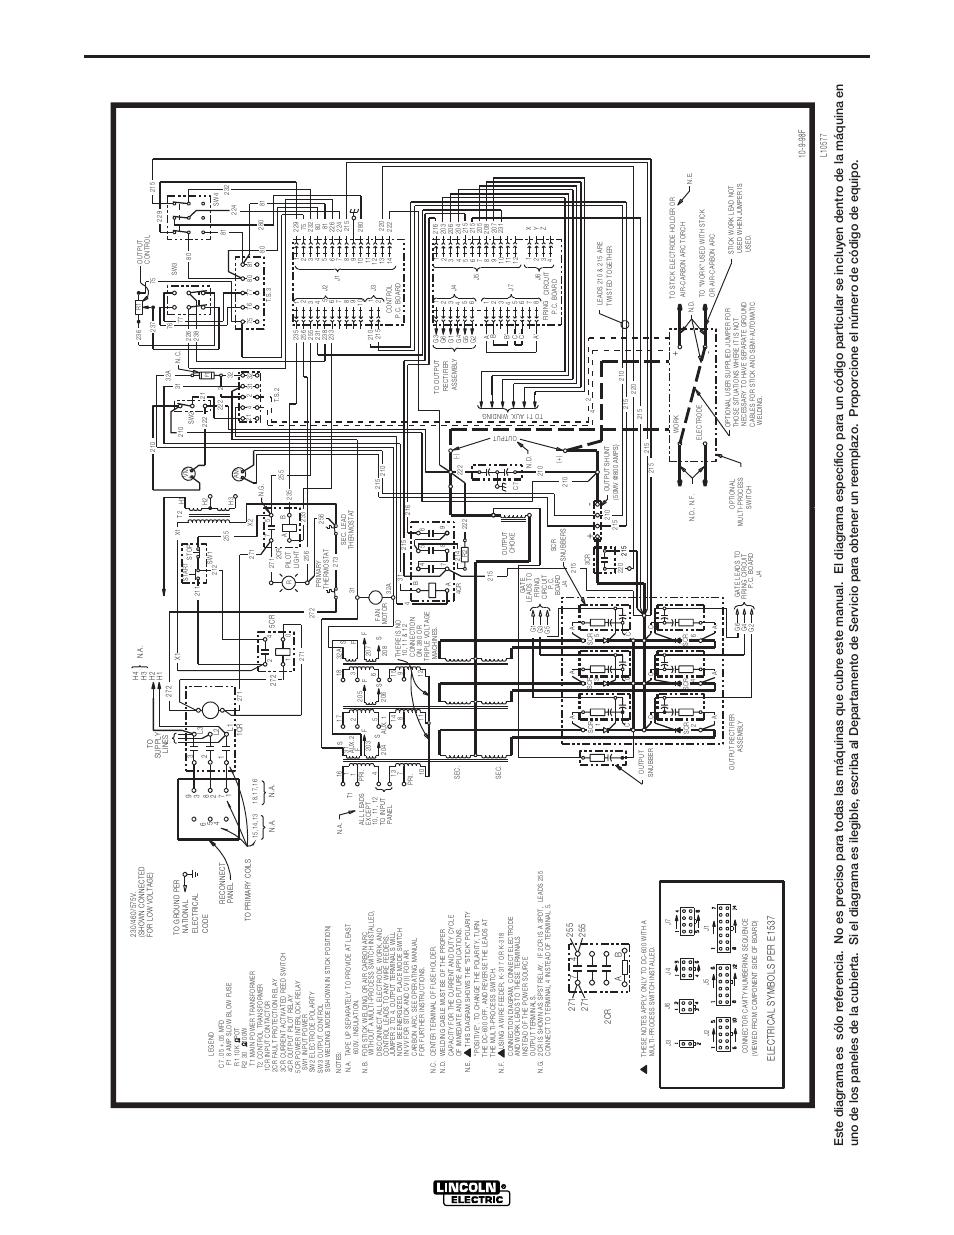 lincoln vantage 400 wiring diagram